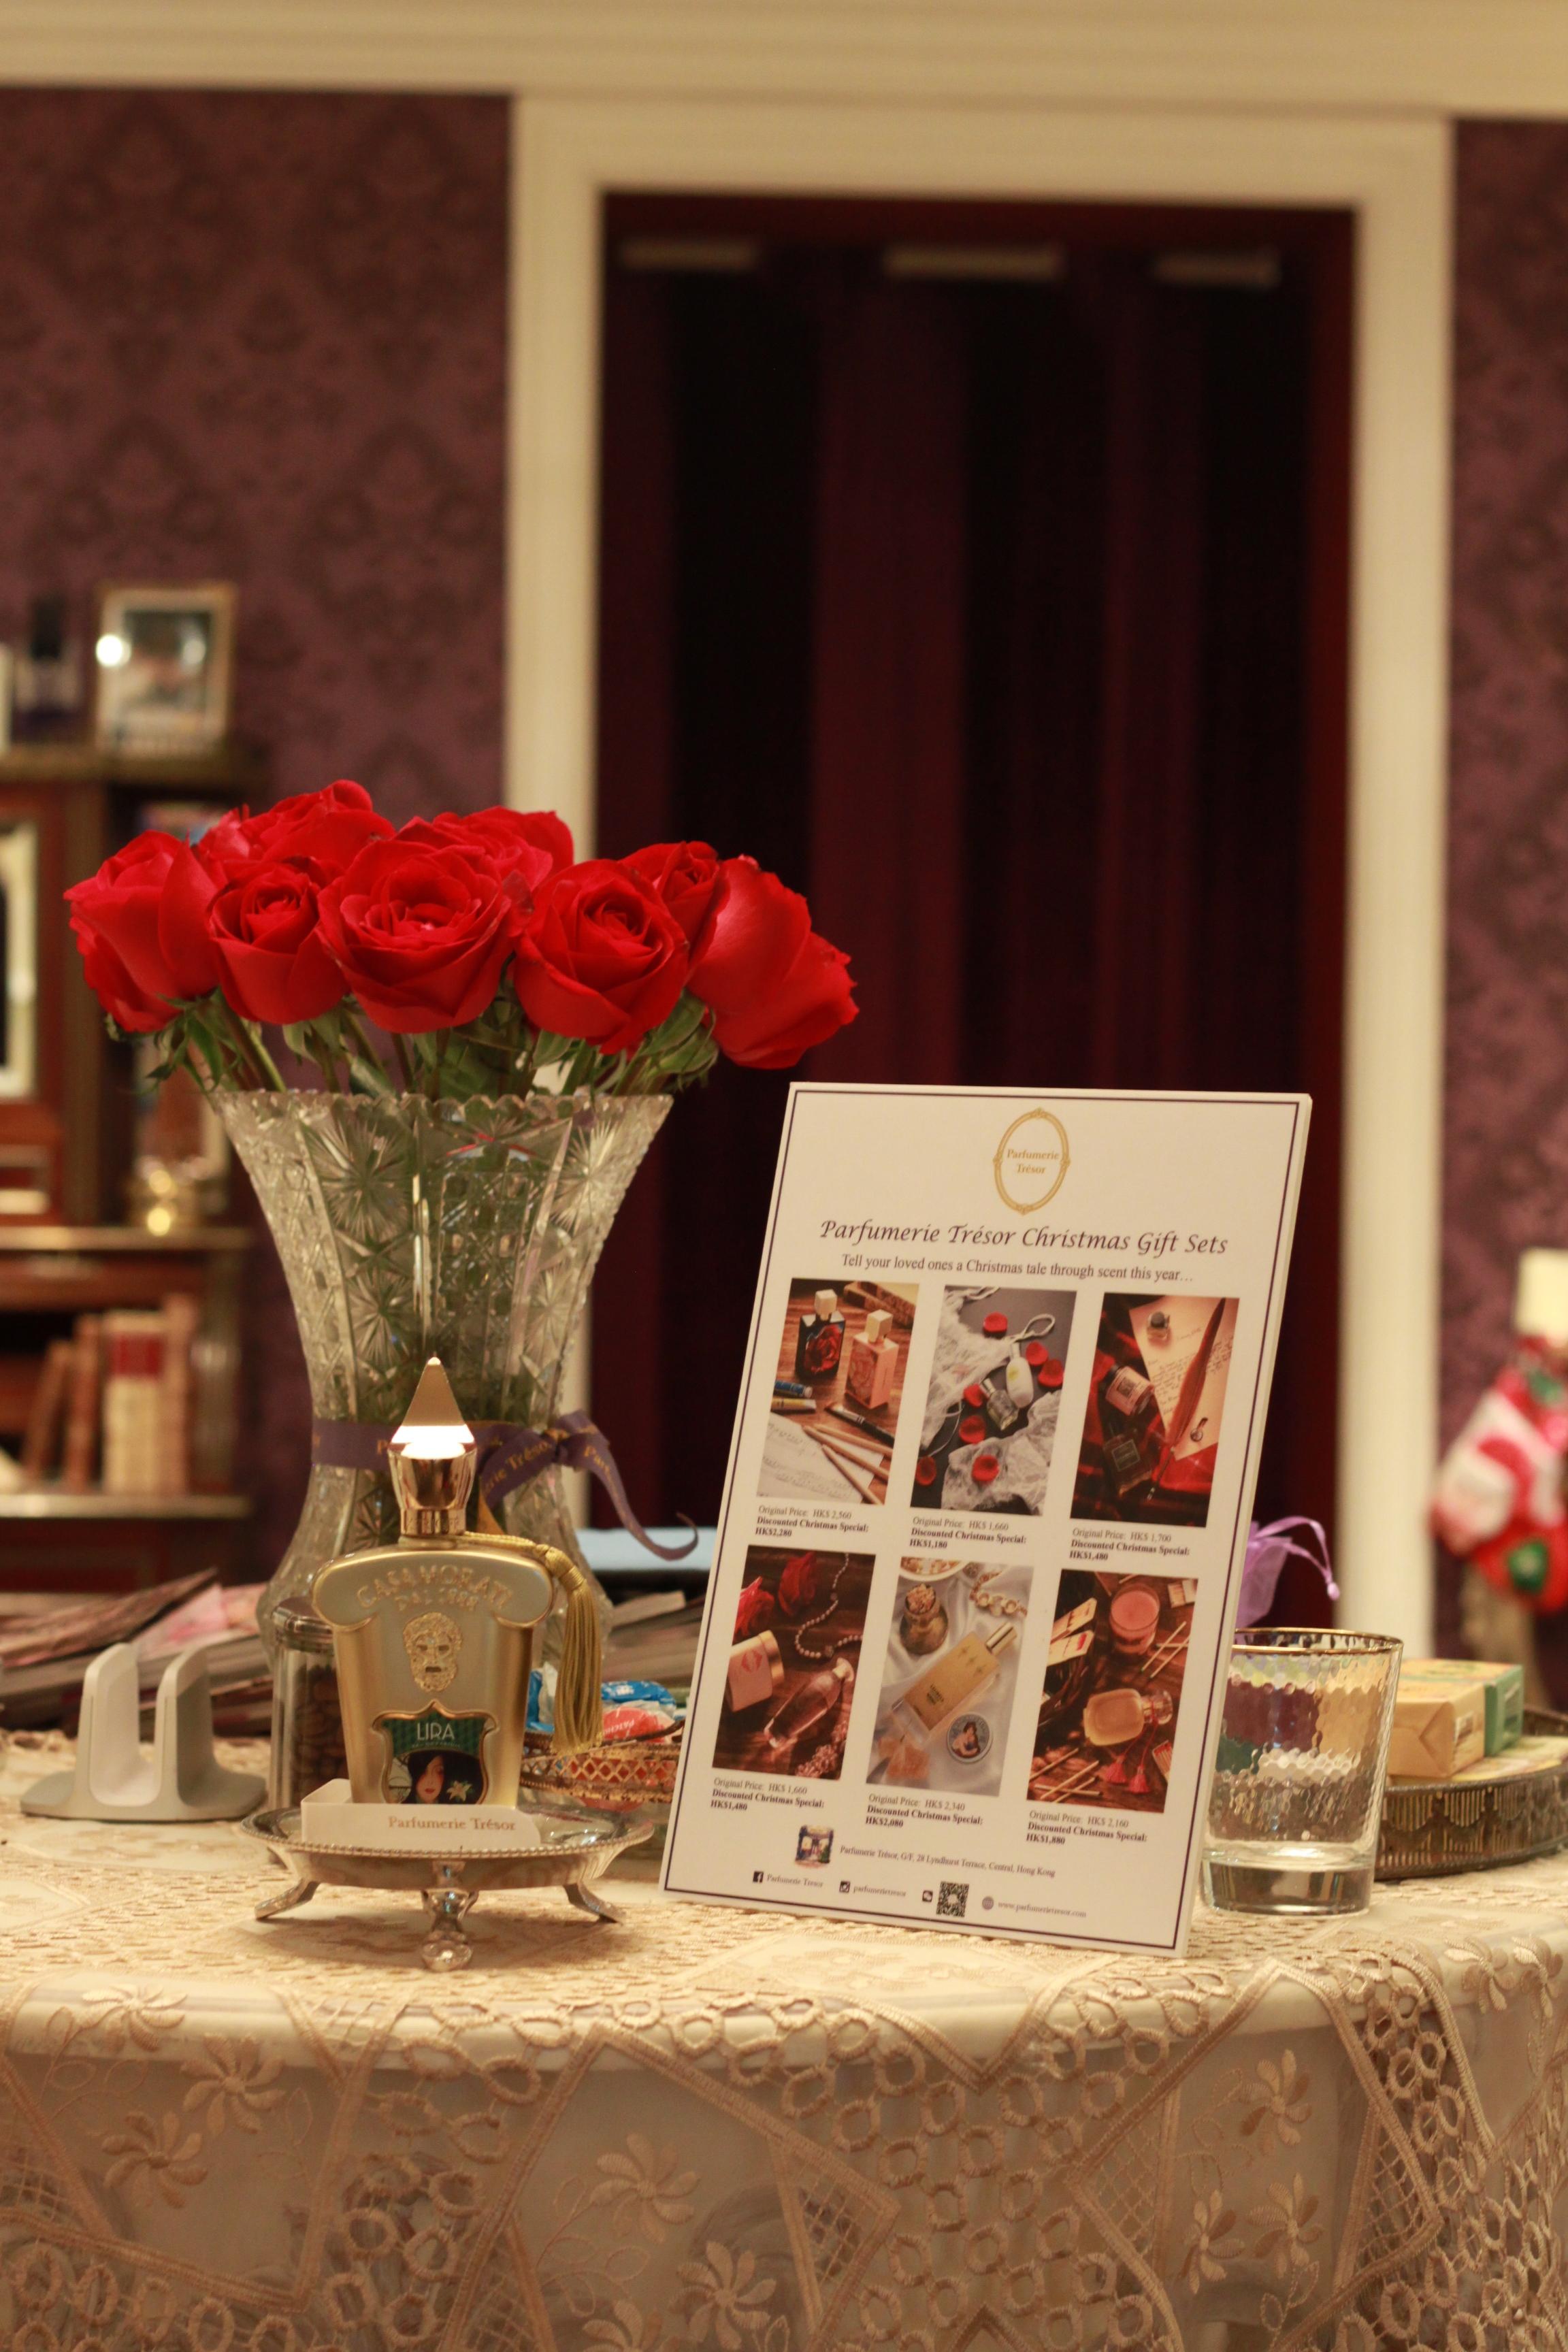 Find my blog with  Parfumerie Trésor